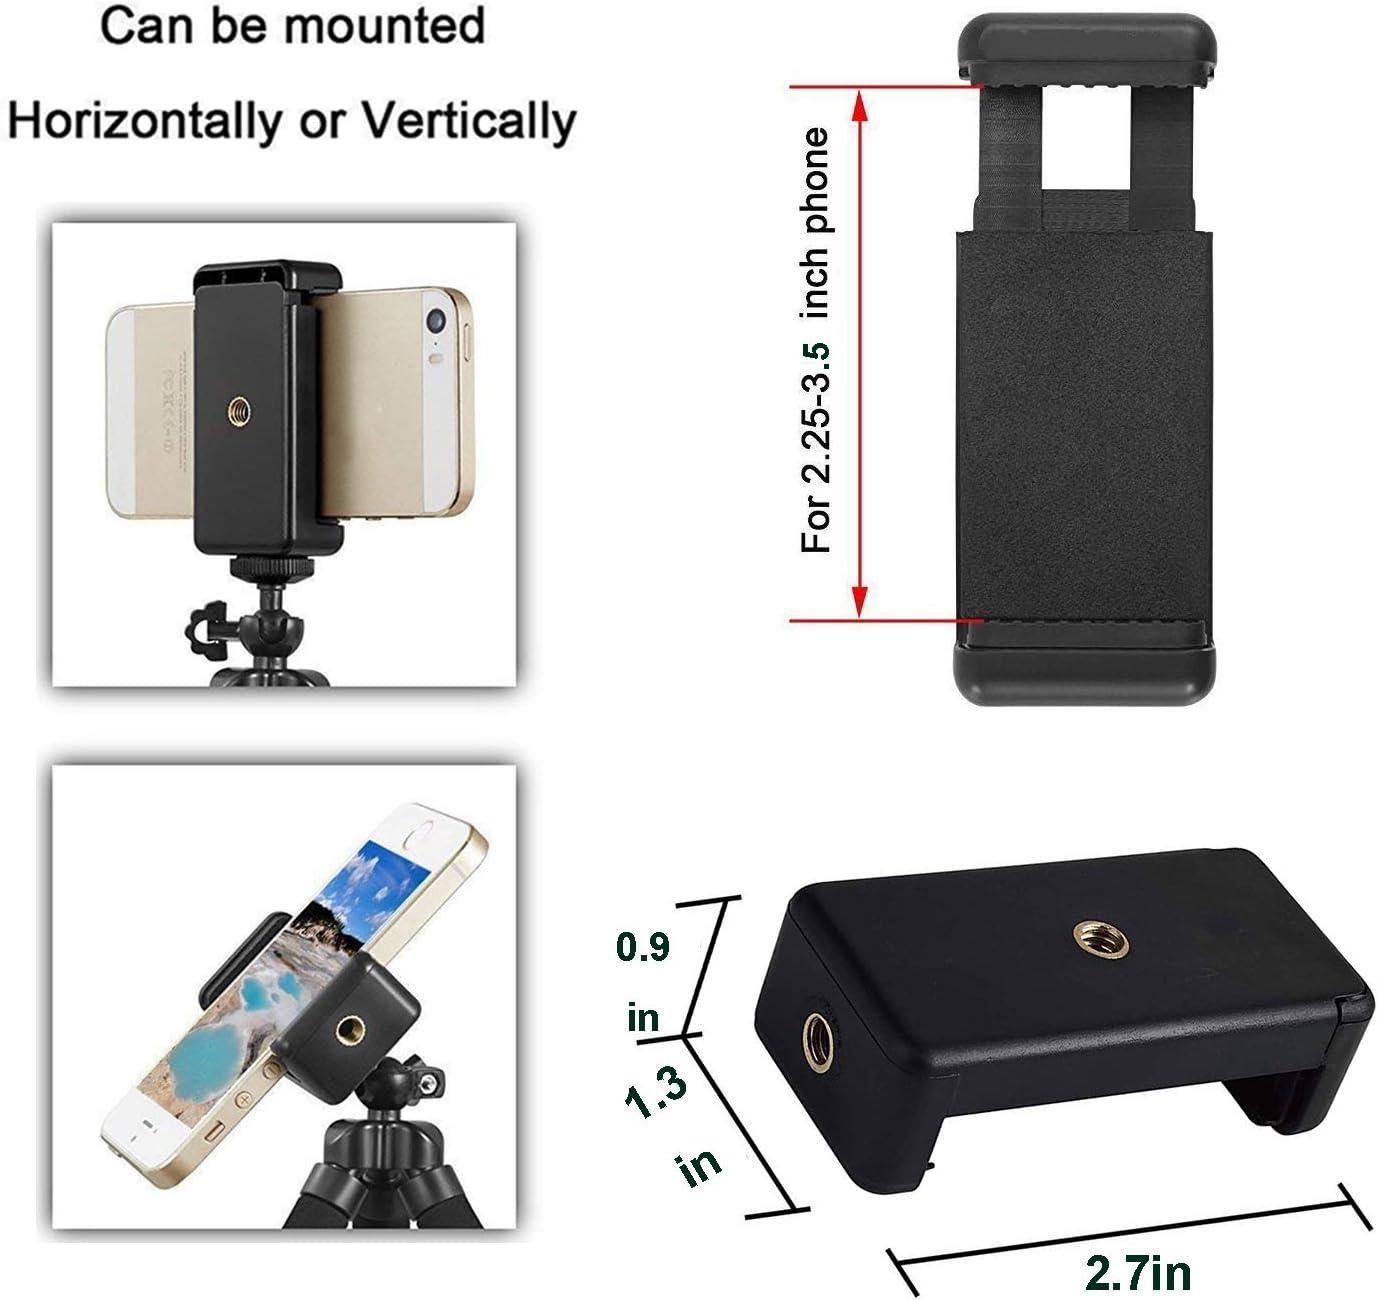 Handheld Mobile Phone Tripod Mount Stand for DJI Osmo Pocket Accessories Phone Holder. Kitspeed OSMO Pocket Tripod